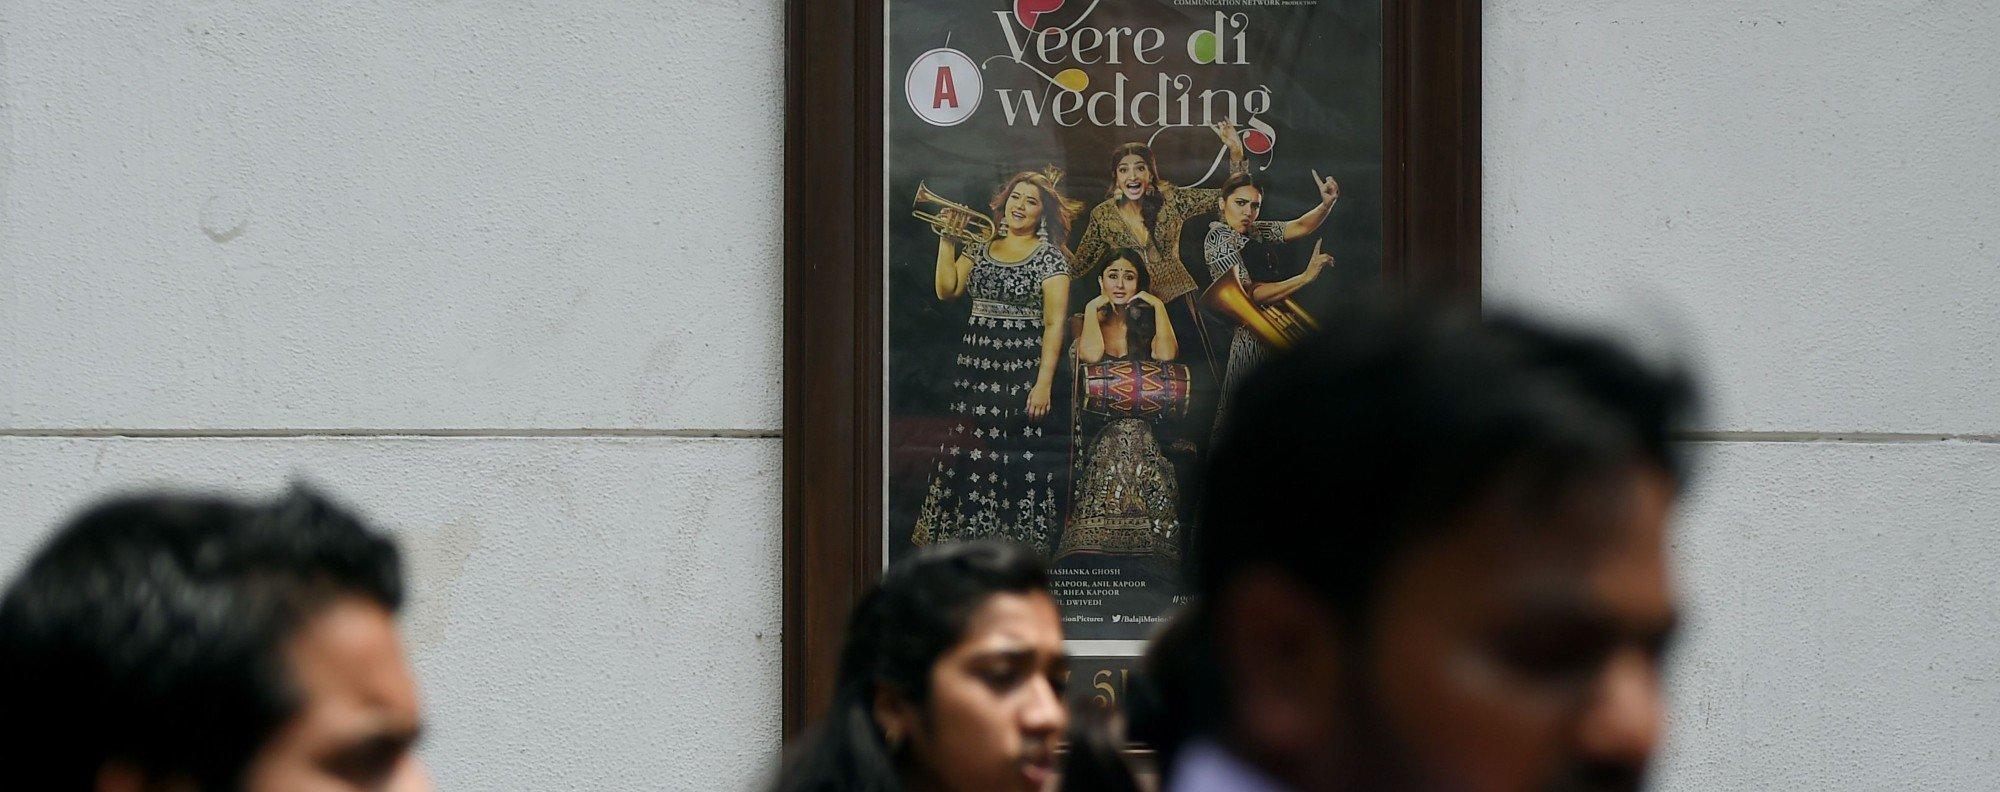 Vibrators to Hindu twitter trolls, Indian film star Swara Bhasker not afraid of shaking things up - This Week In Asia - South China Morning Post Vibrators to Twitter trolls, Swara Bhasker likes to shake things up - 웹